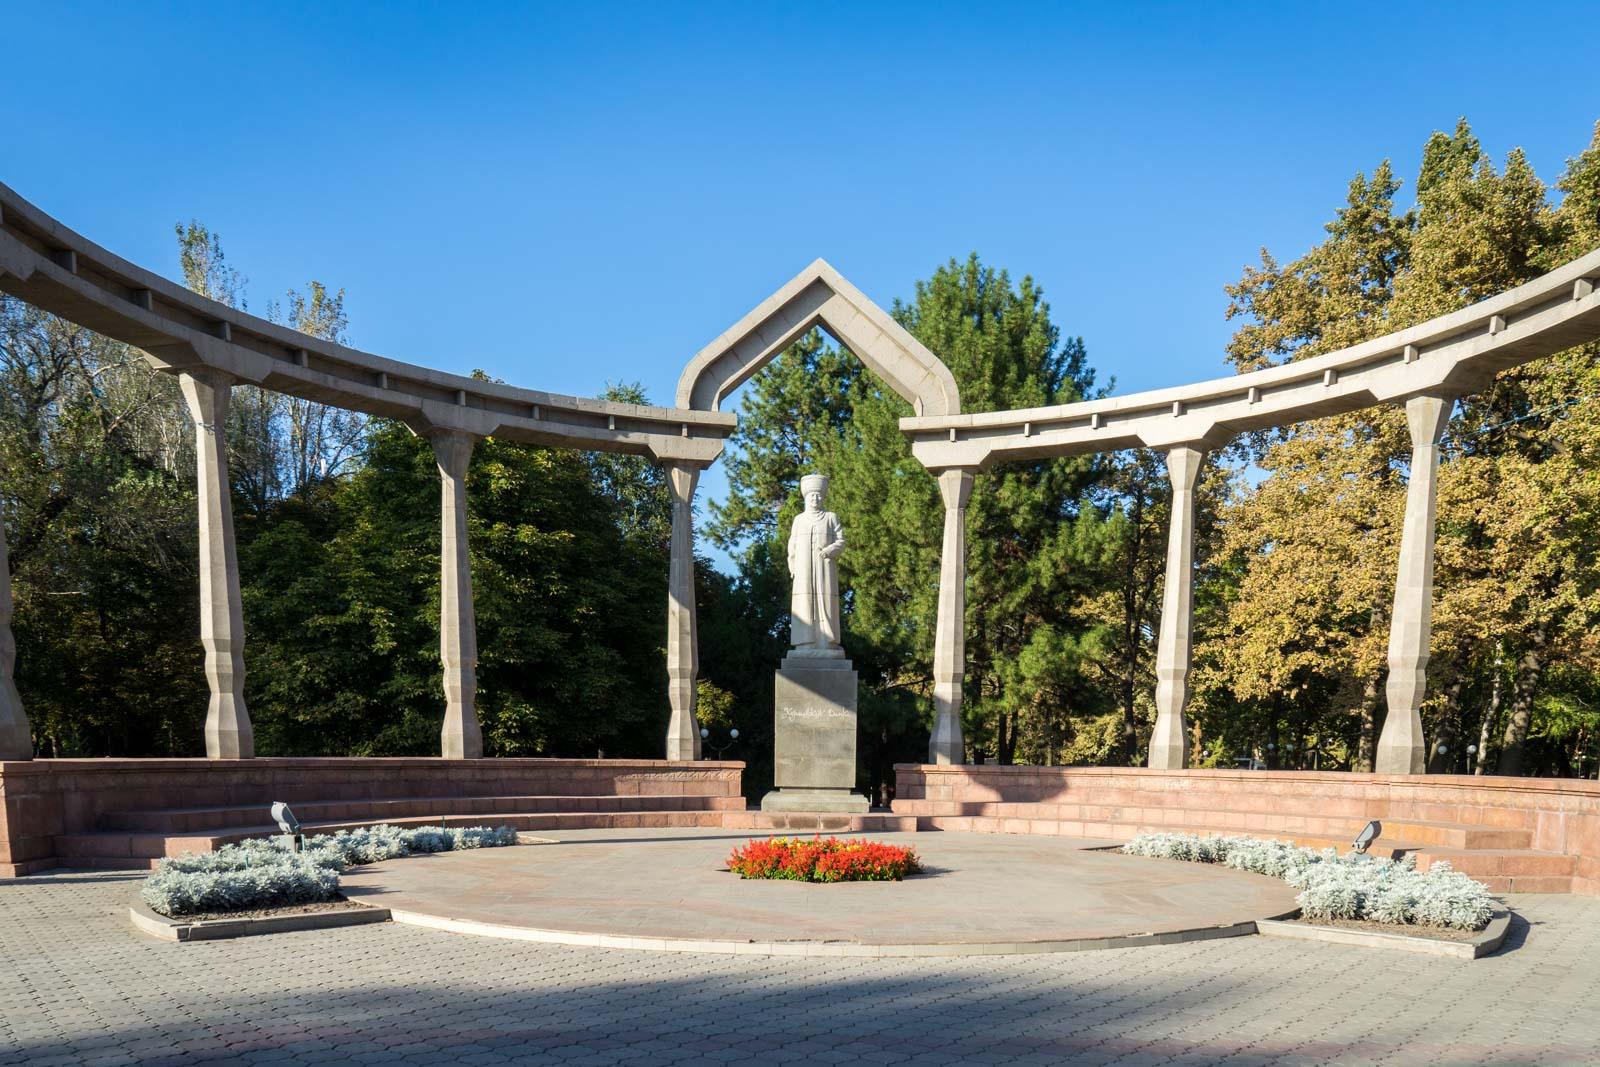 Kurmanjan Datka statue, Bishkek, Kyrgyzstan